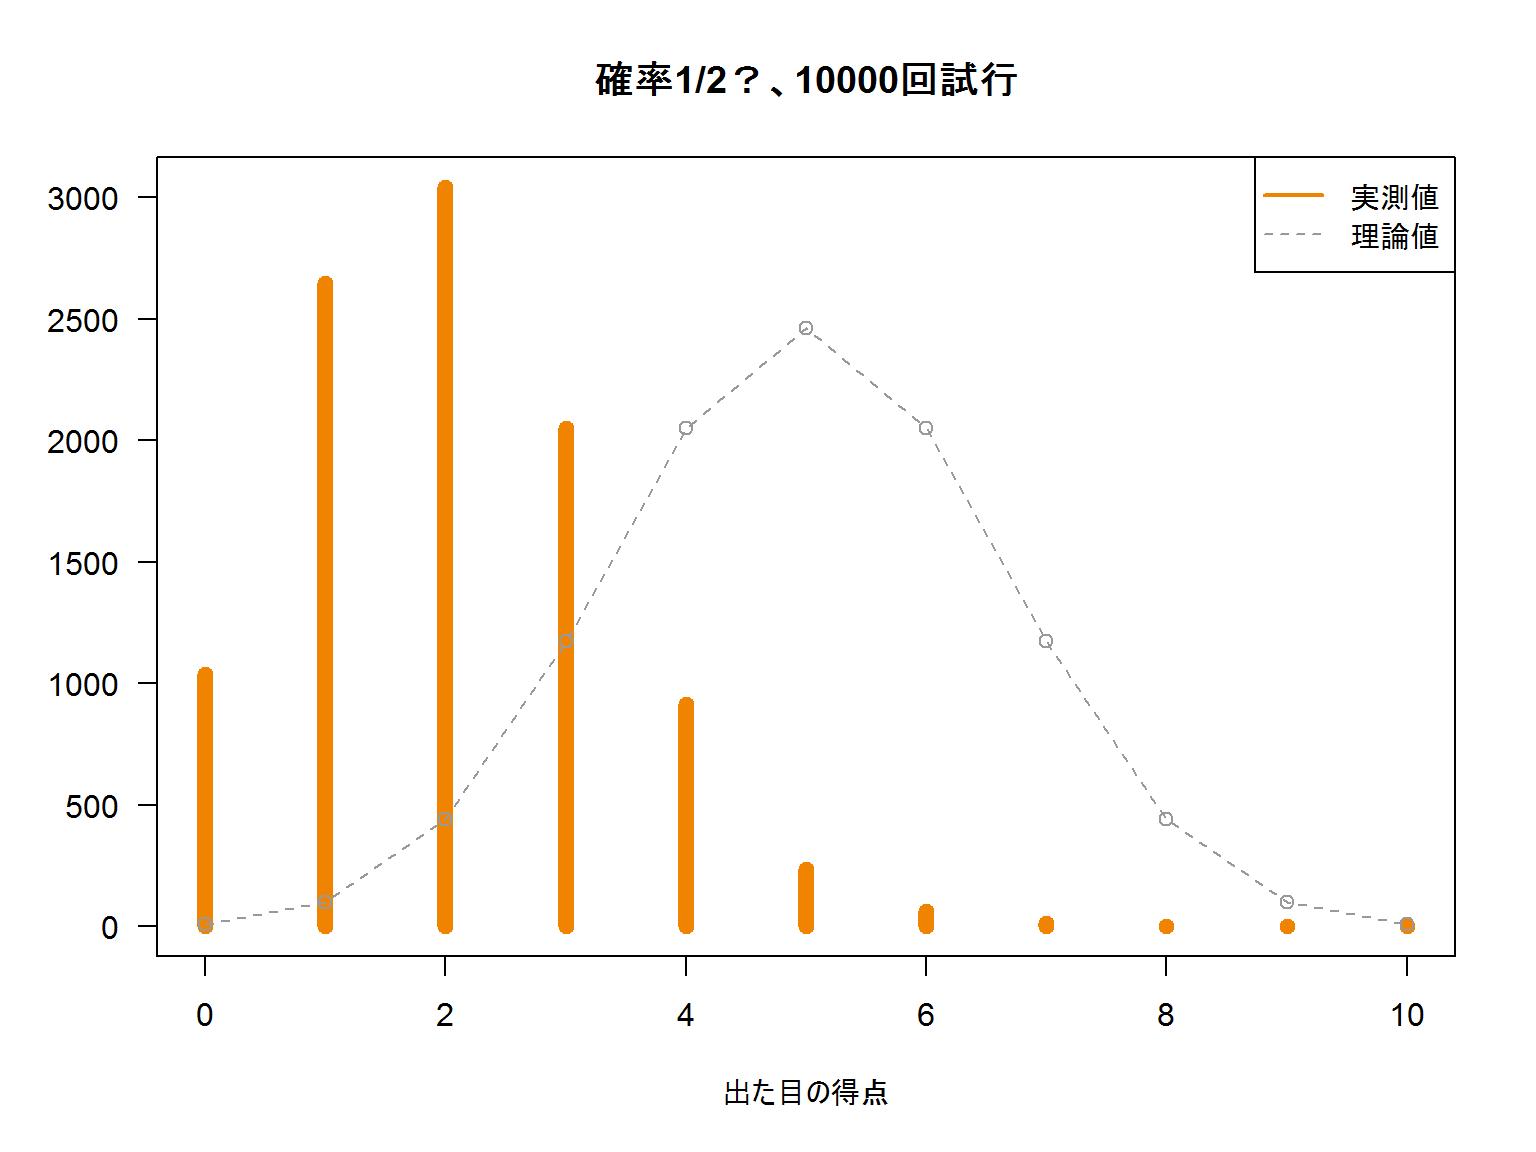 binom_test_1-3